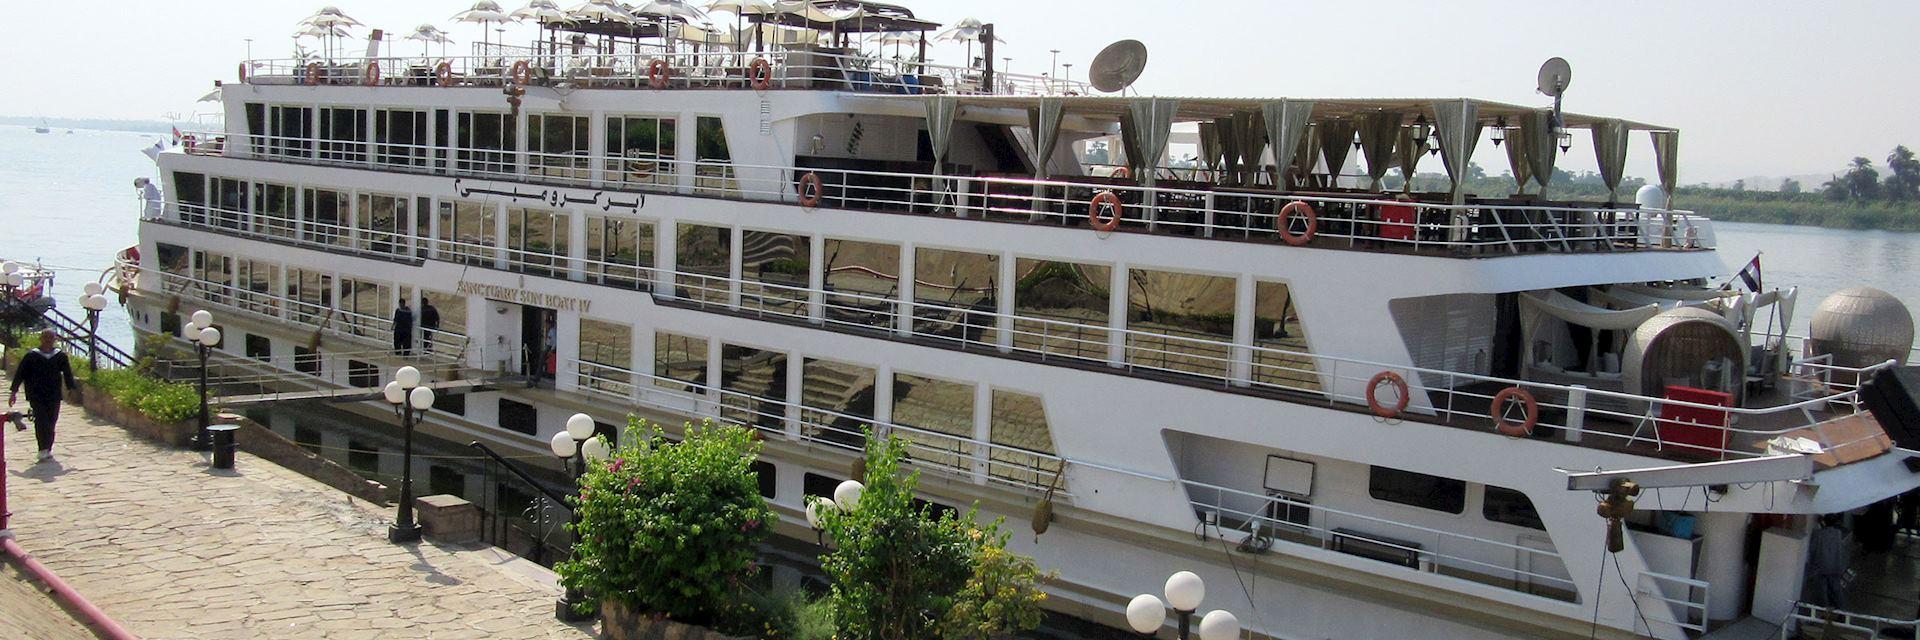 M/S Sun Boat IV